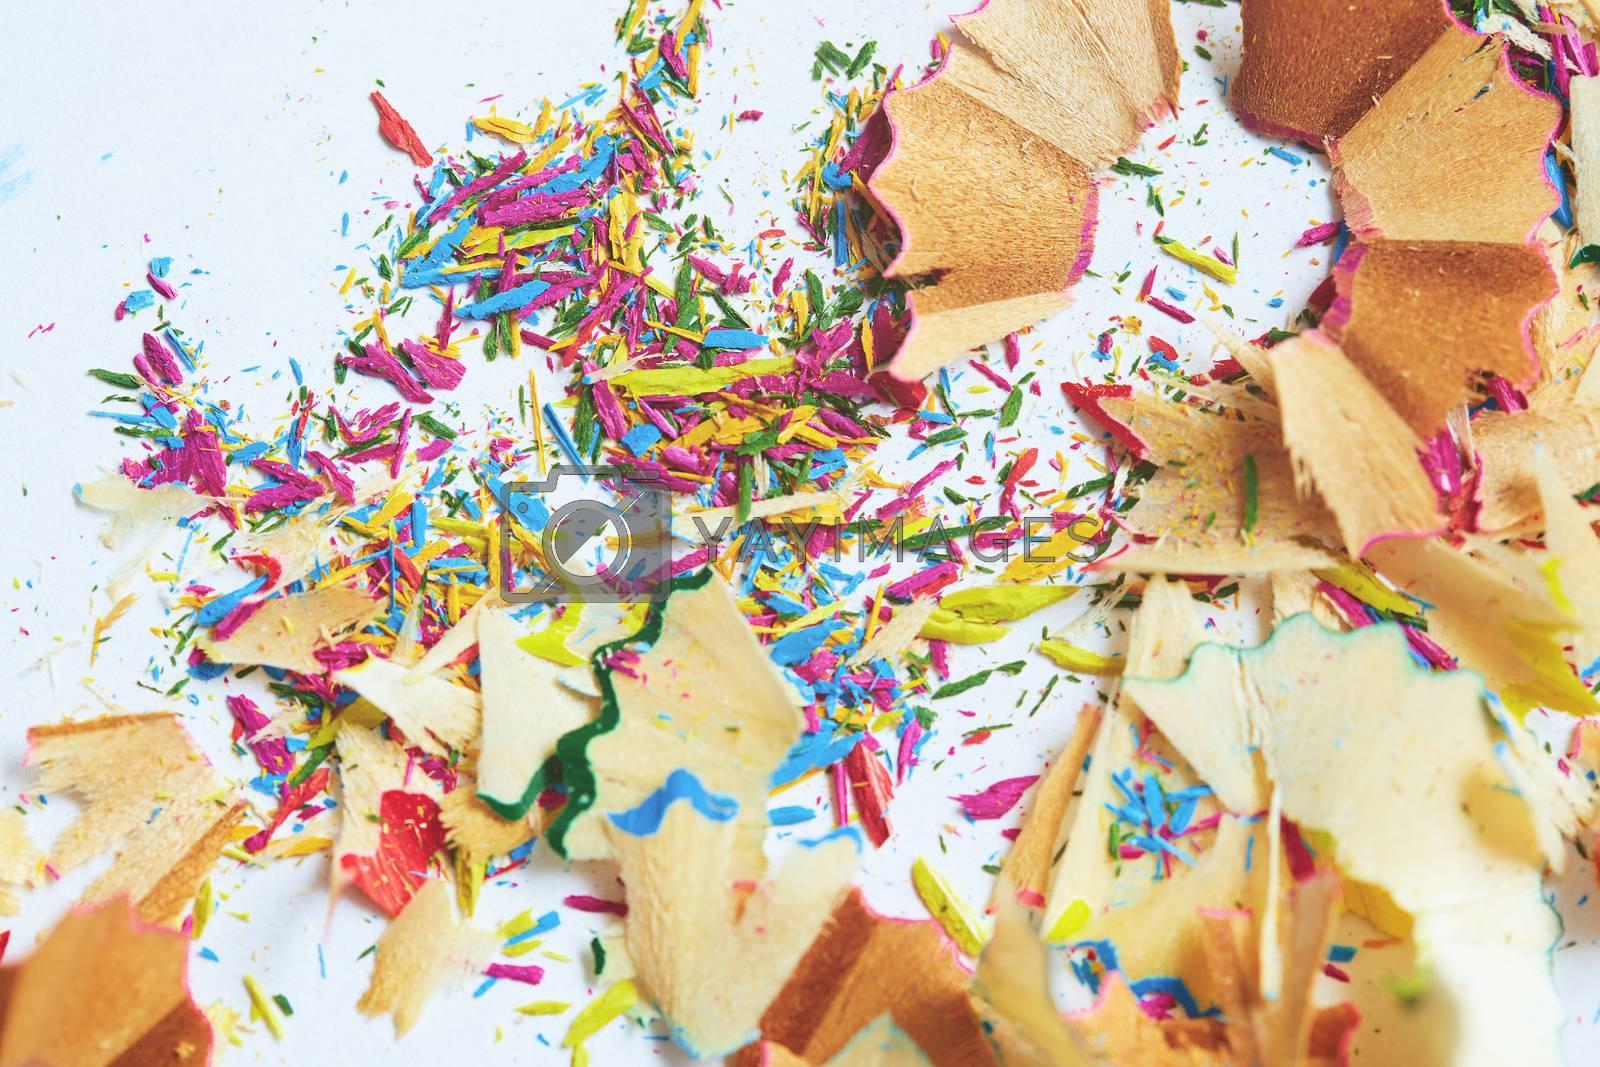 Colored pencils trash. Close-up horizontal photo